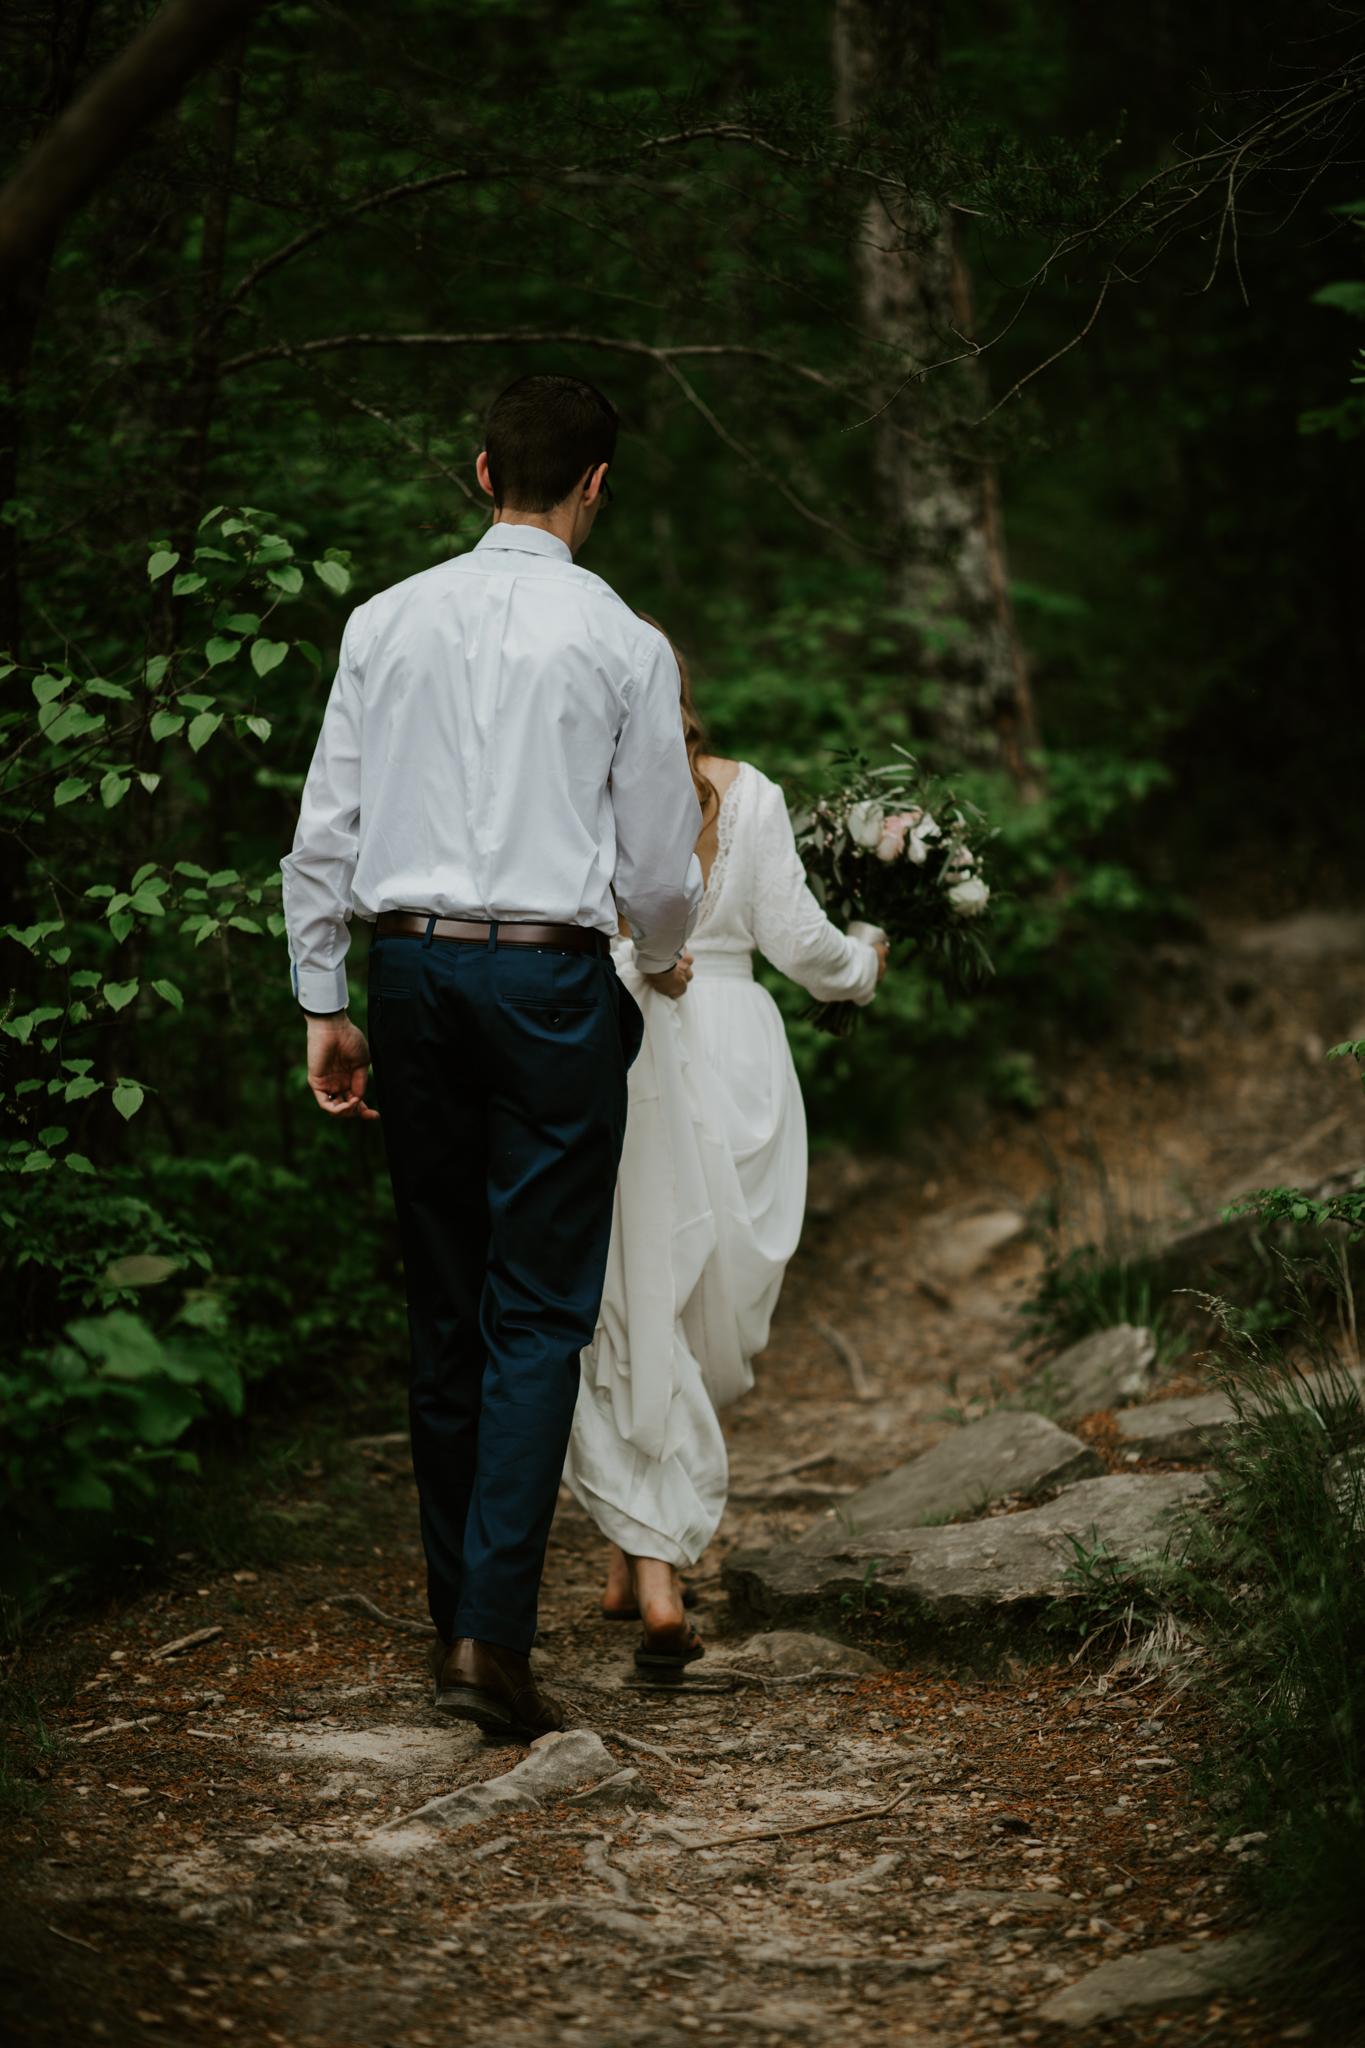 Lacey-Joe-Chattanooga-Nashville-Tennessee-Wedding-Elopement-Photographer-143.jpg